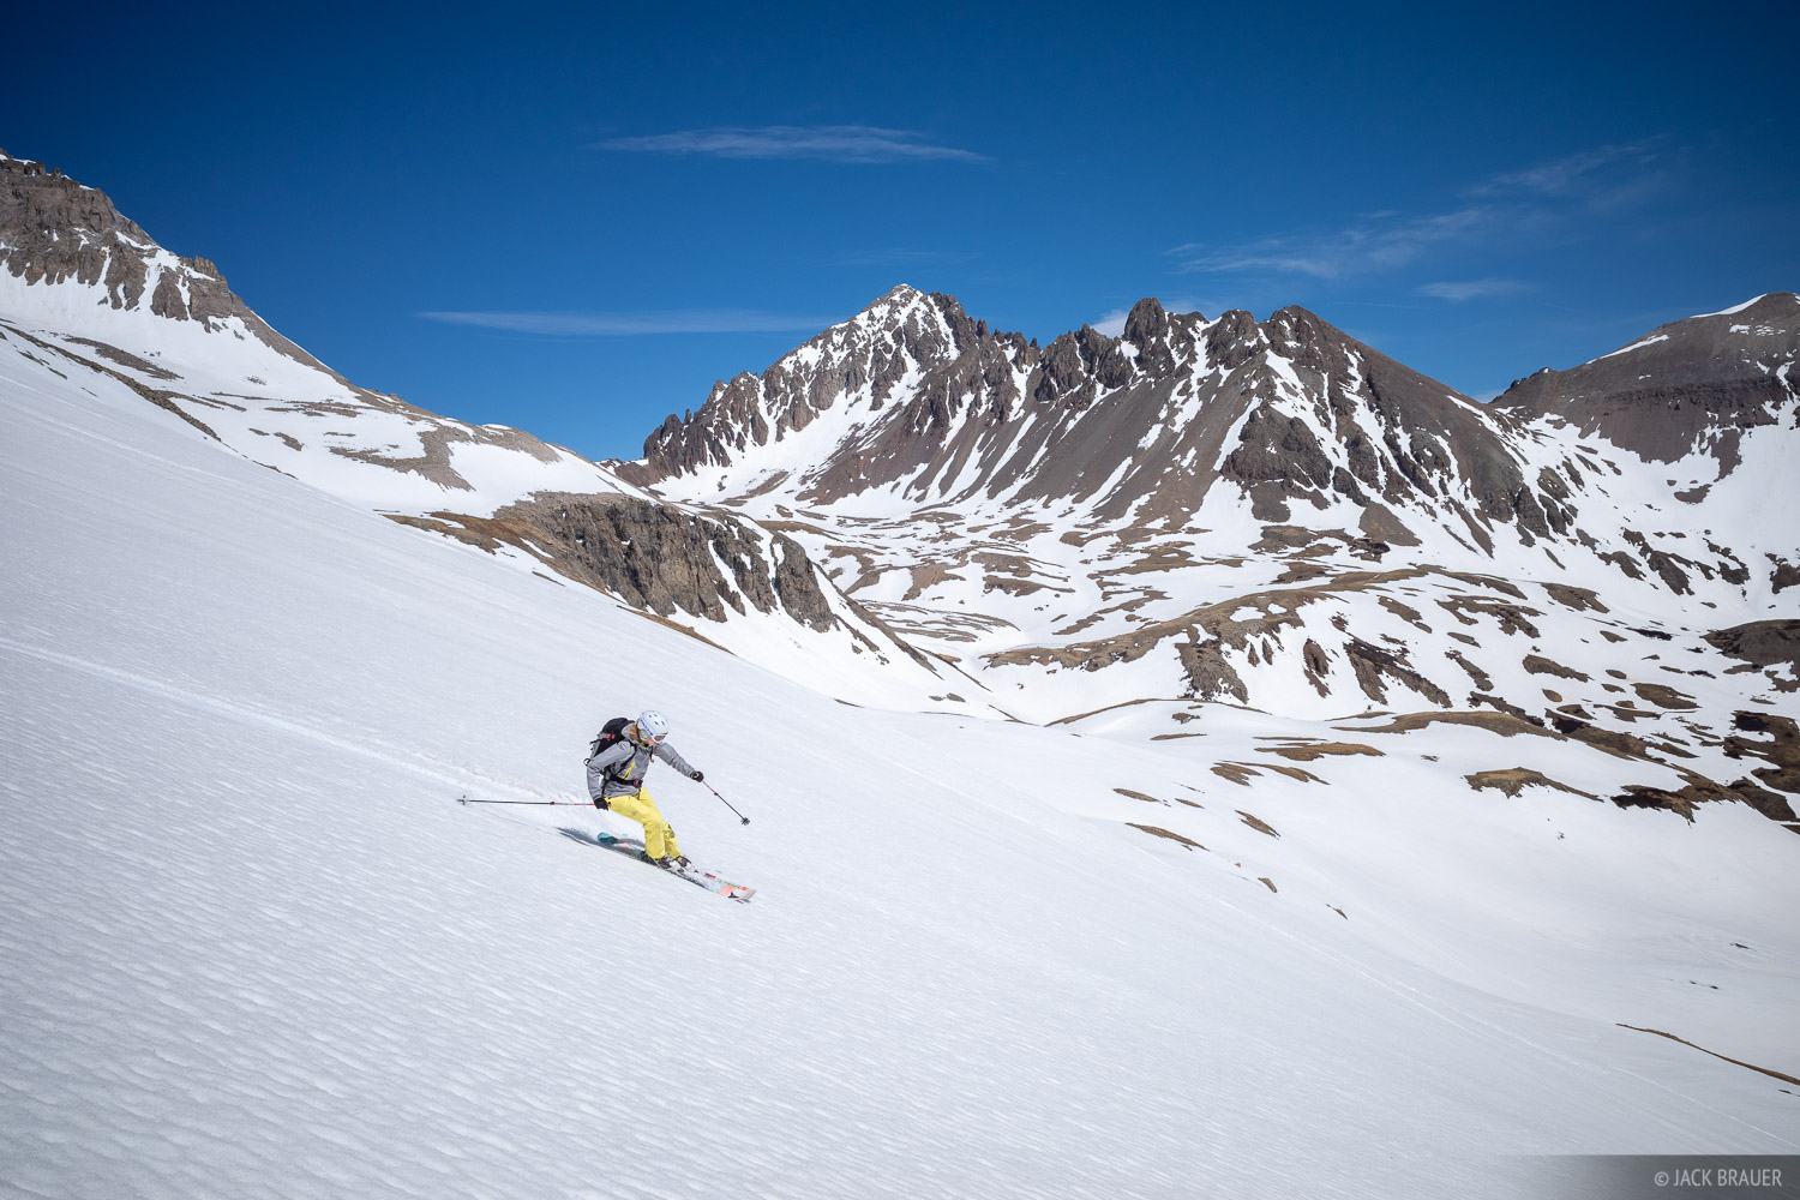 Colorado, Ema's Rollers, Mt. Sneffels, San Juan Mountains, Sneffels Range, skiing